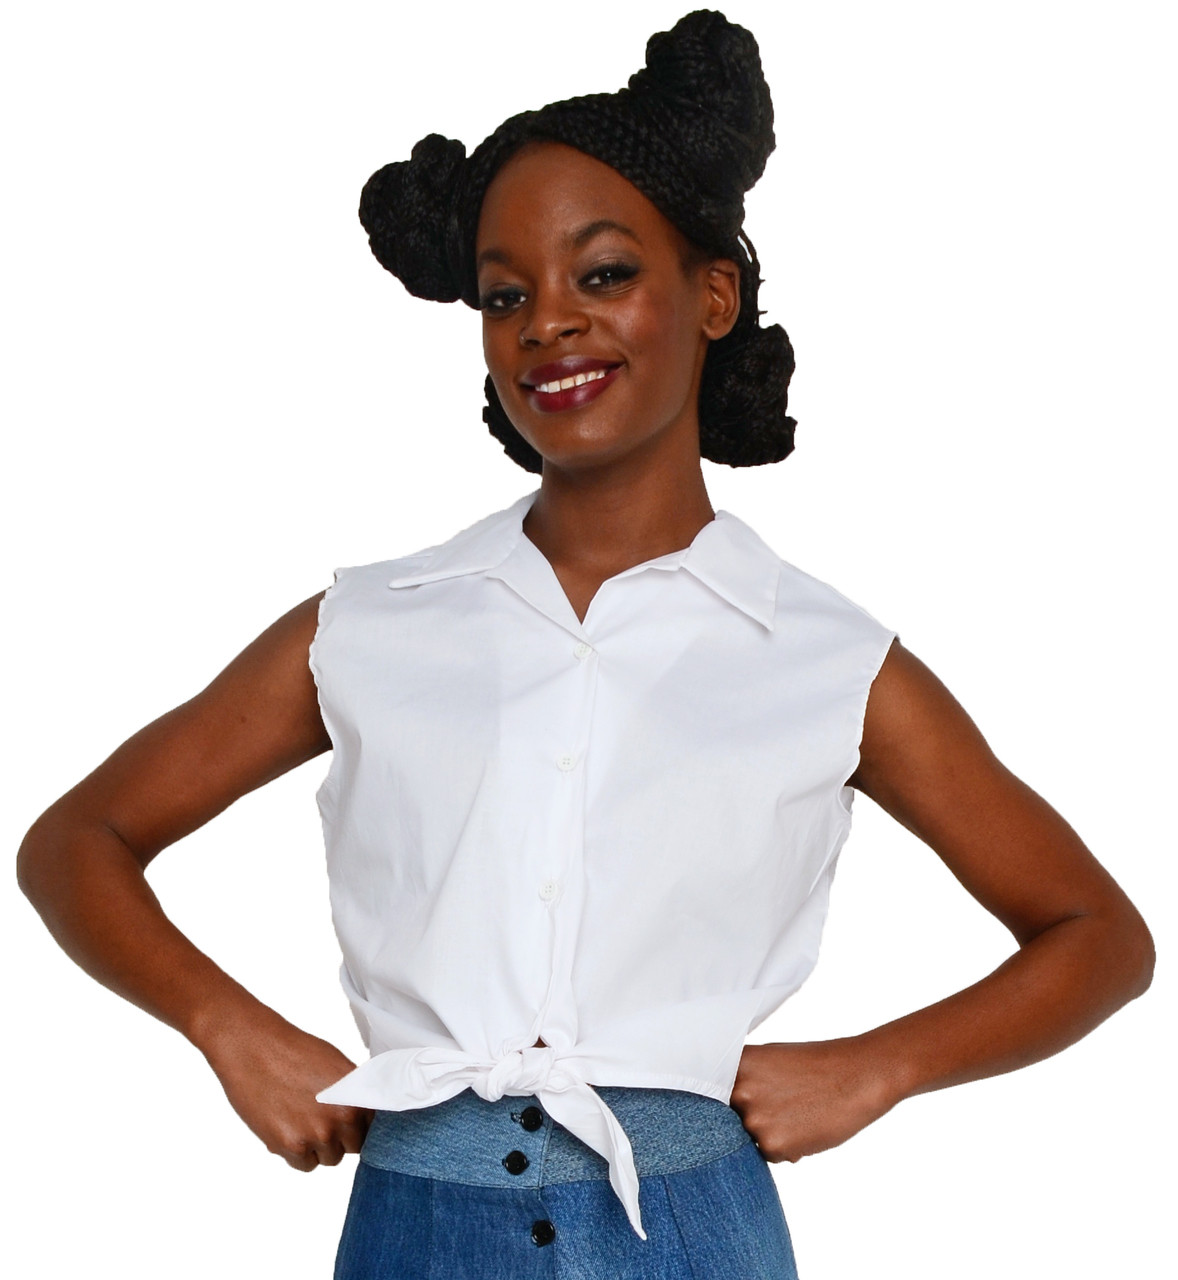 c8430b4e 50s Style Sleeveless Button Up Tie Front Blouse - White Cotton